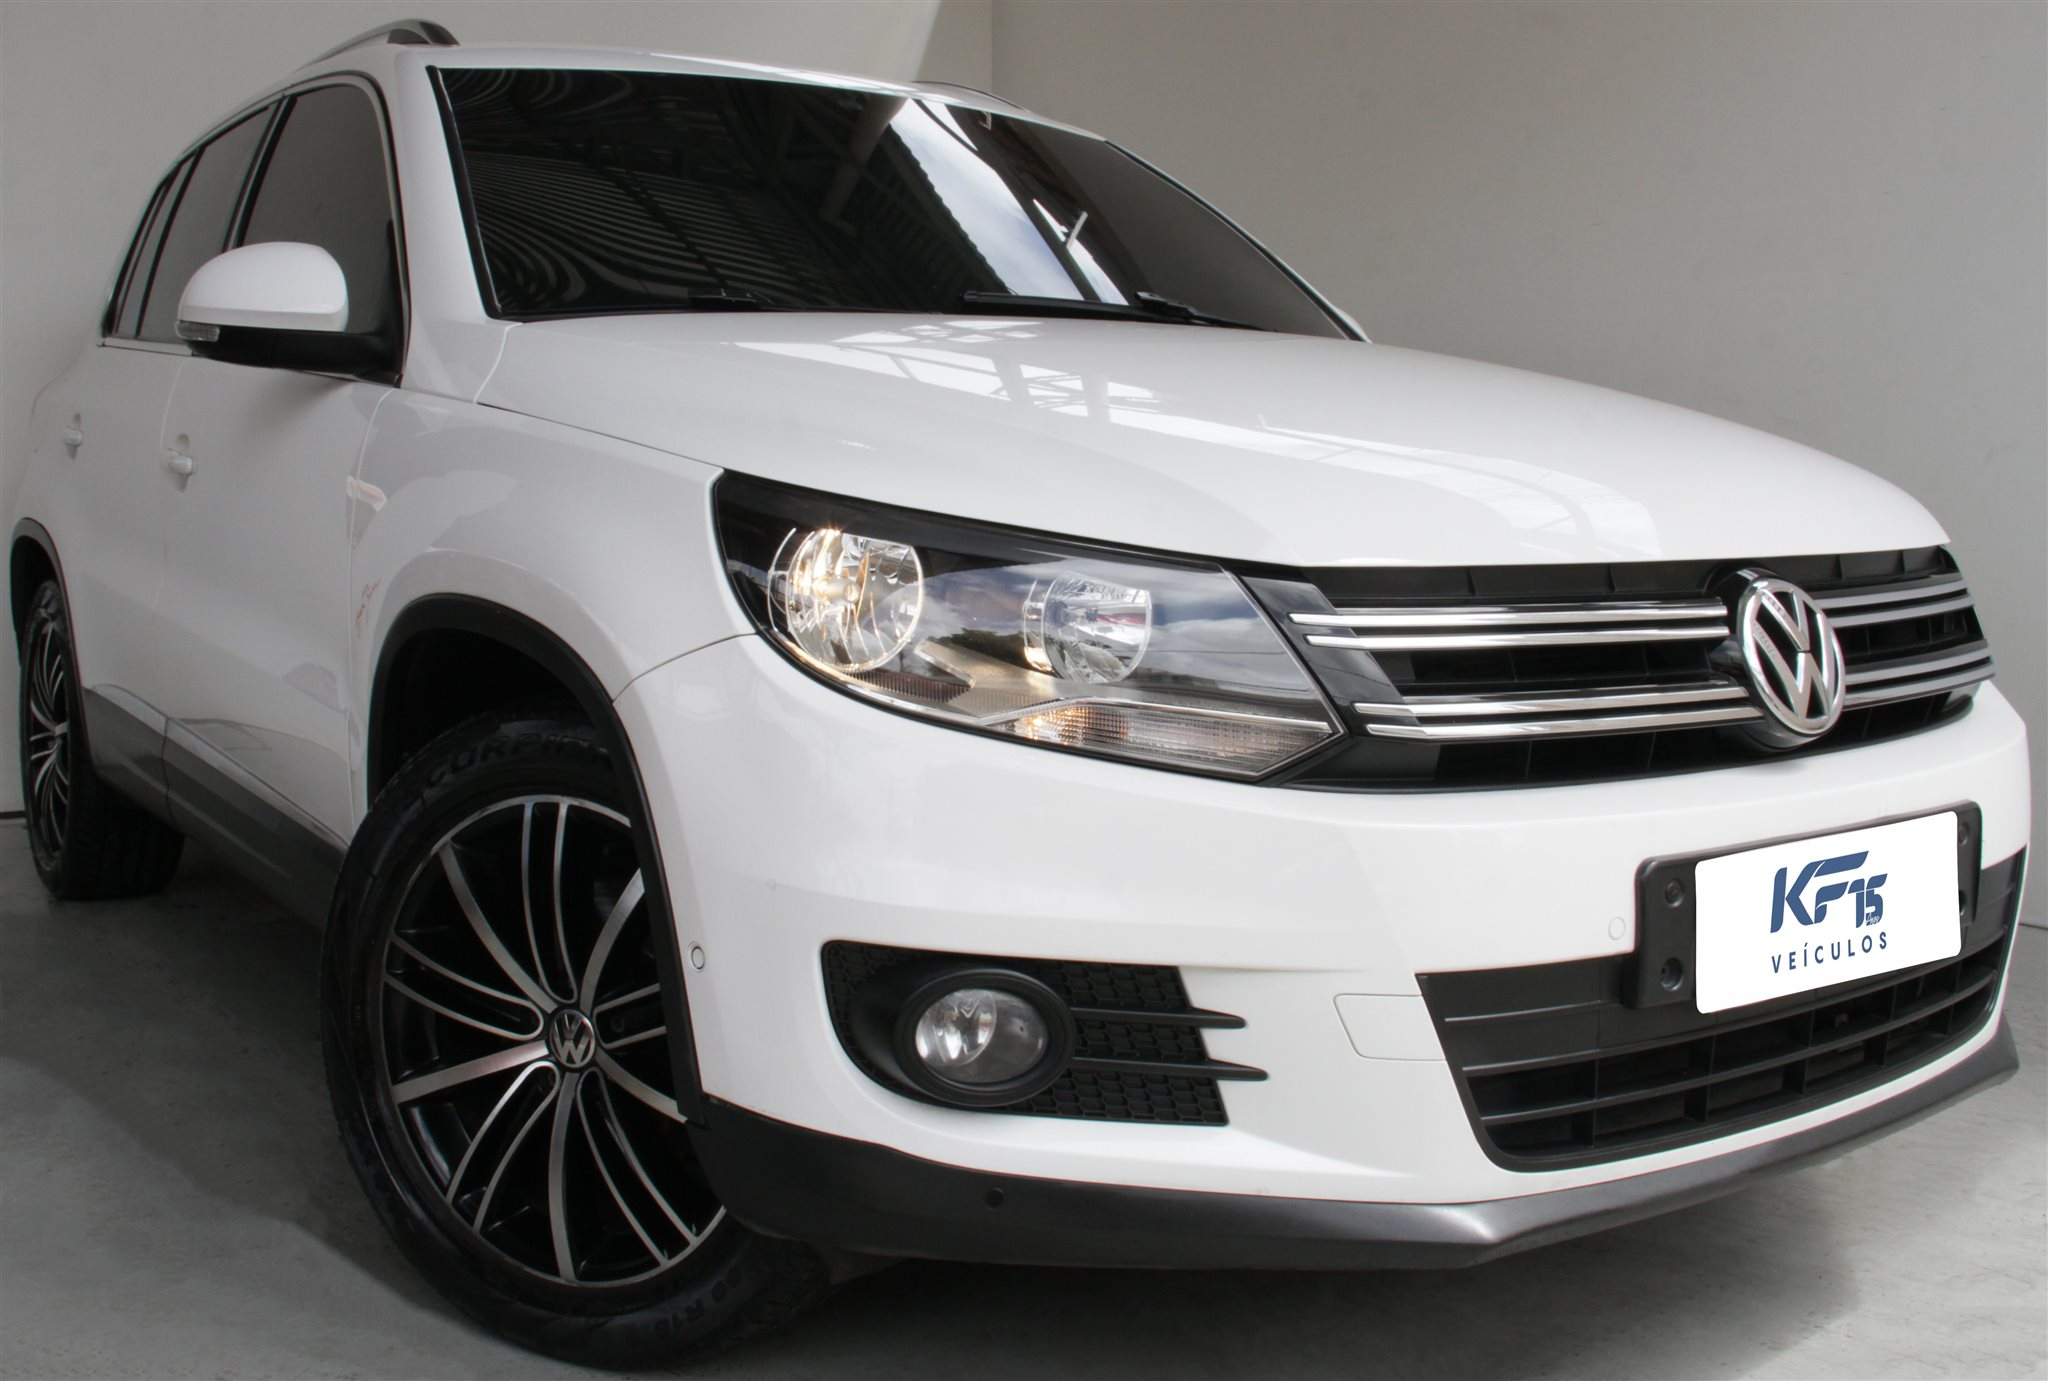 VW - VolksWagen AMAROK Highline CD 2.0 16V TDI 4x4 Dies.